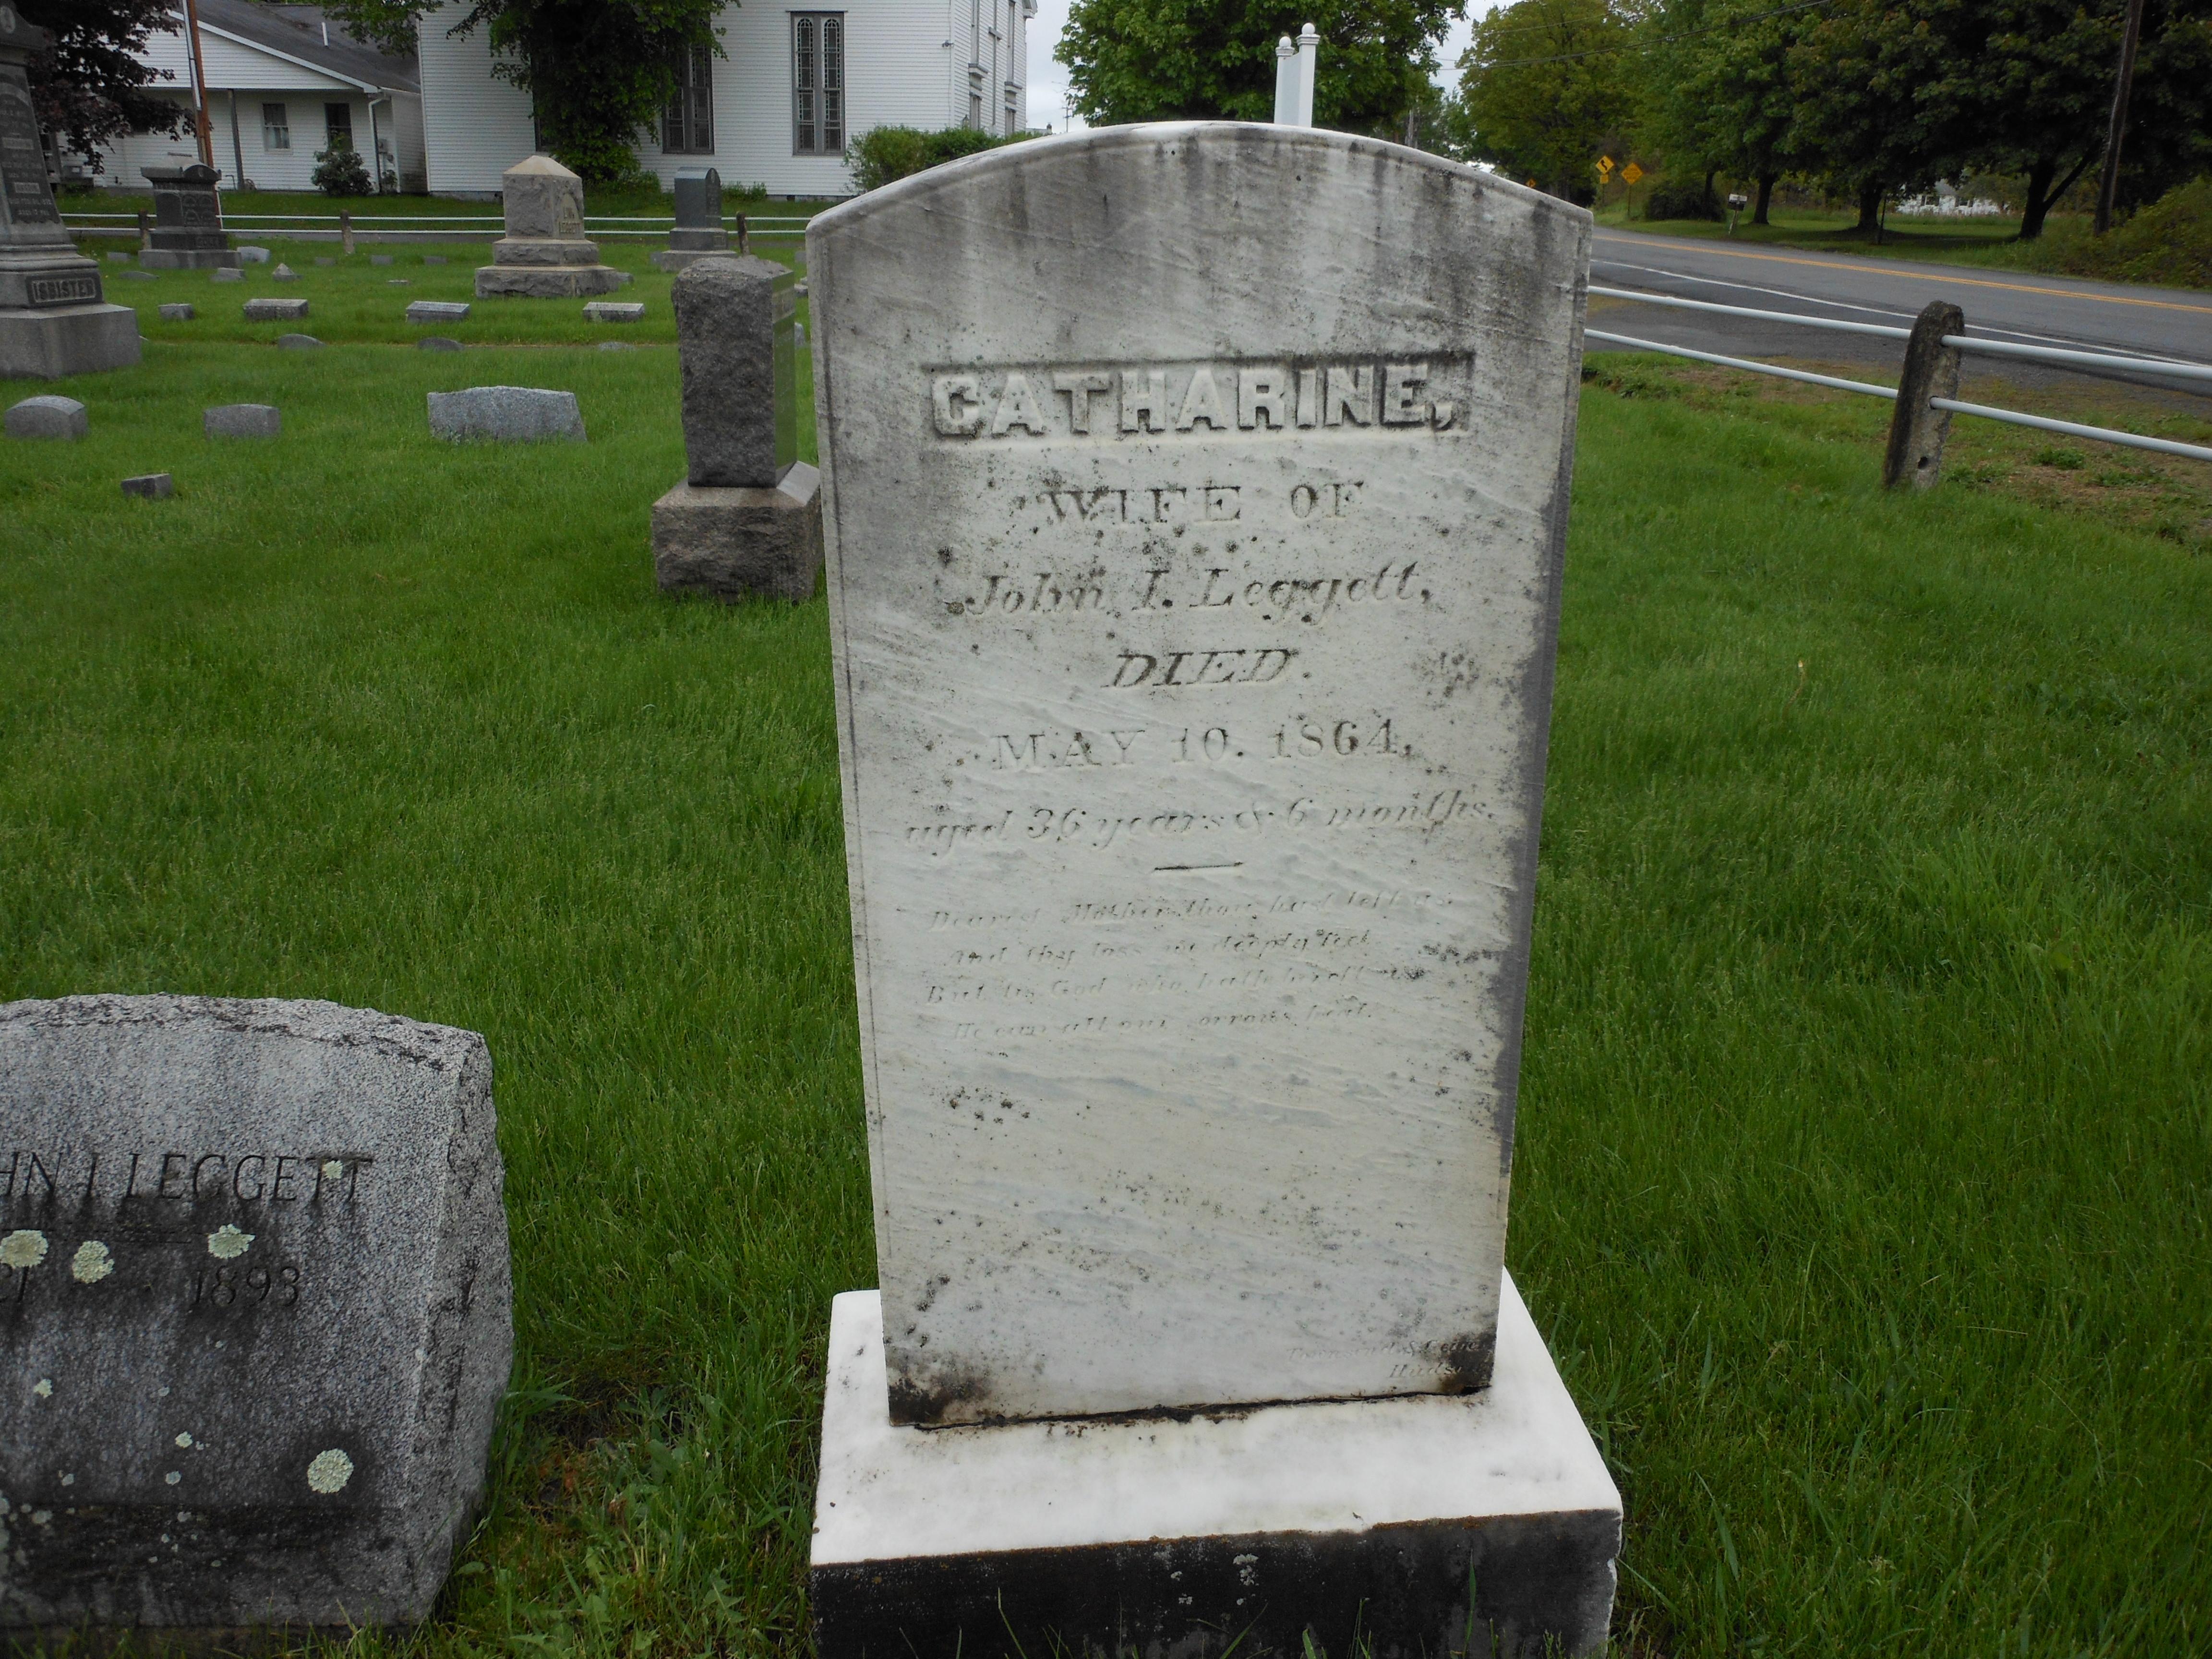 Catharine Leggett